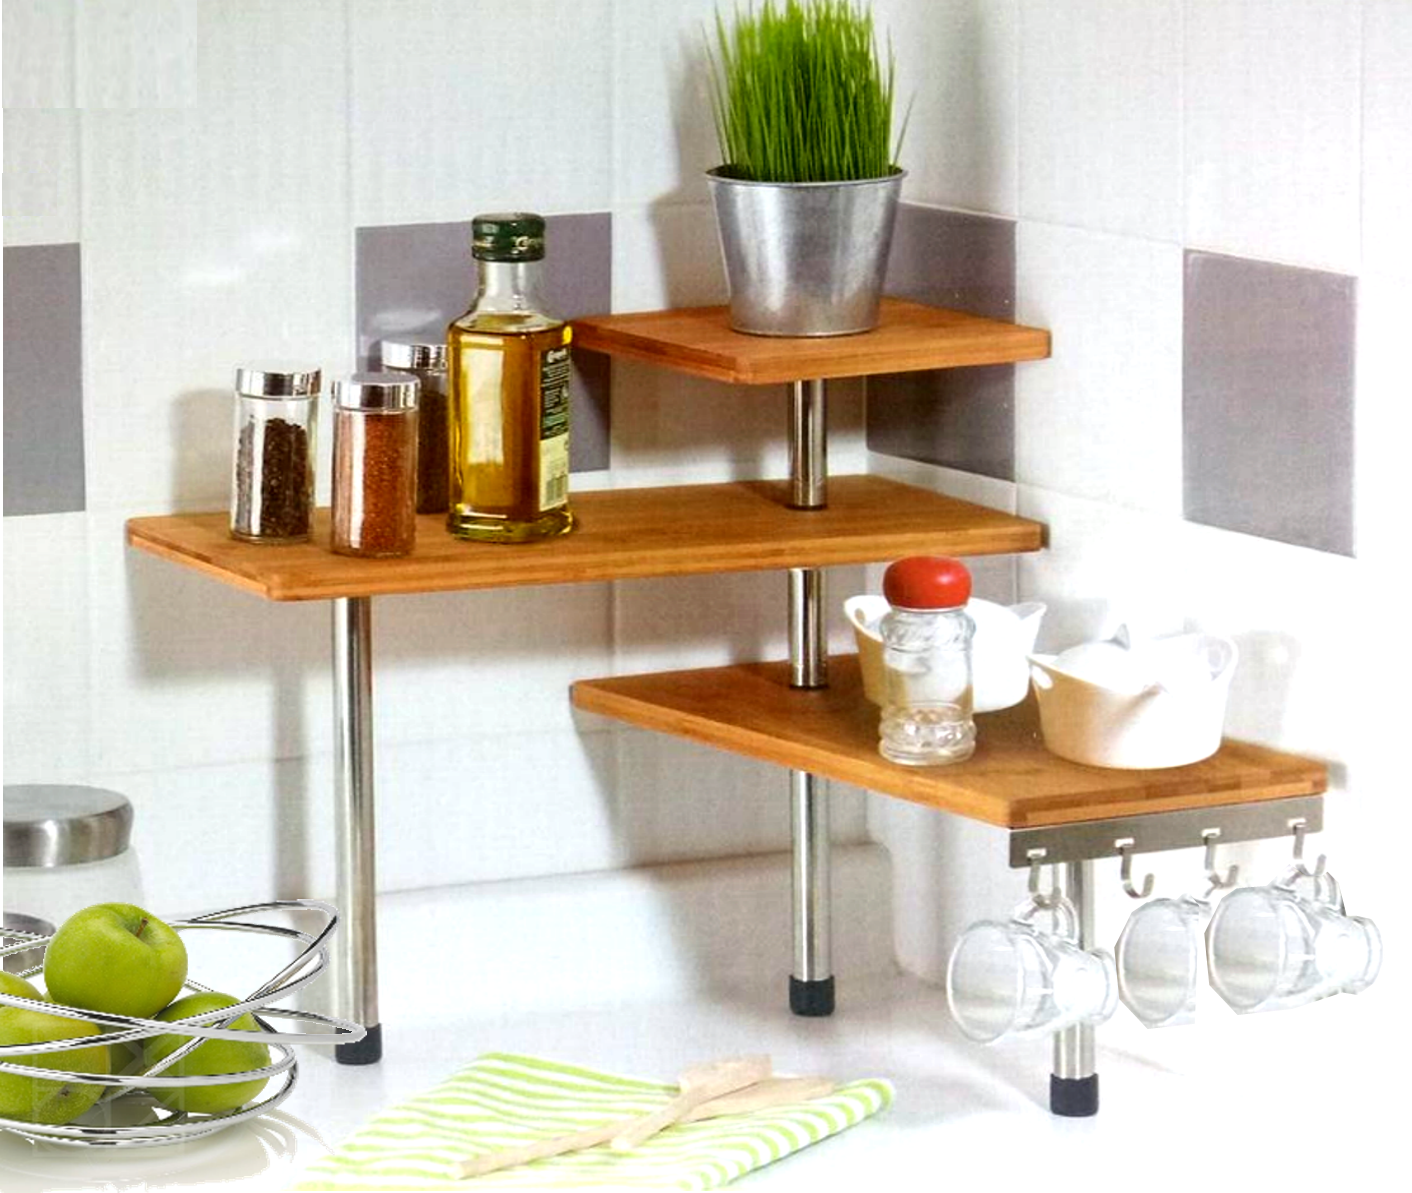 tagre angle cuisine stunning perfect tiroir angle cuisine castorama cuisine gossip blanc une. Black Bedroom Furniture Sets. Home Design Ideas